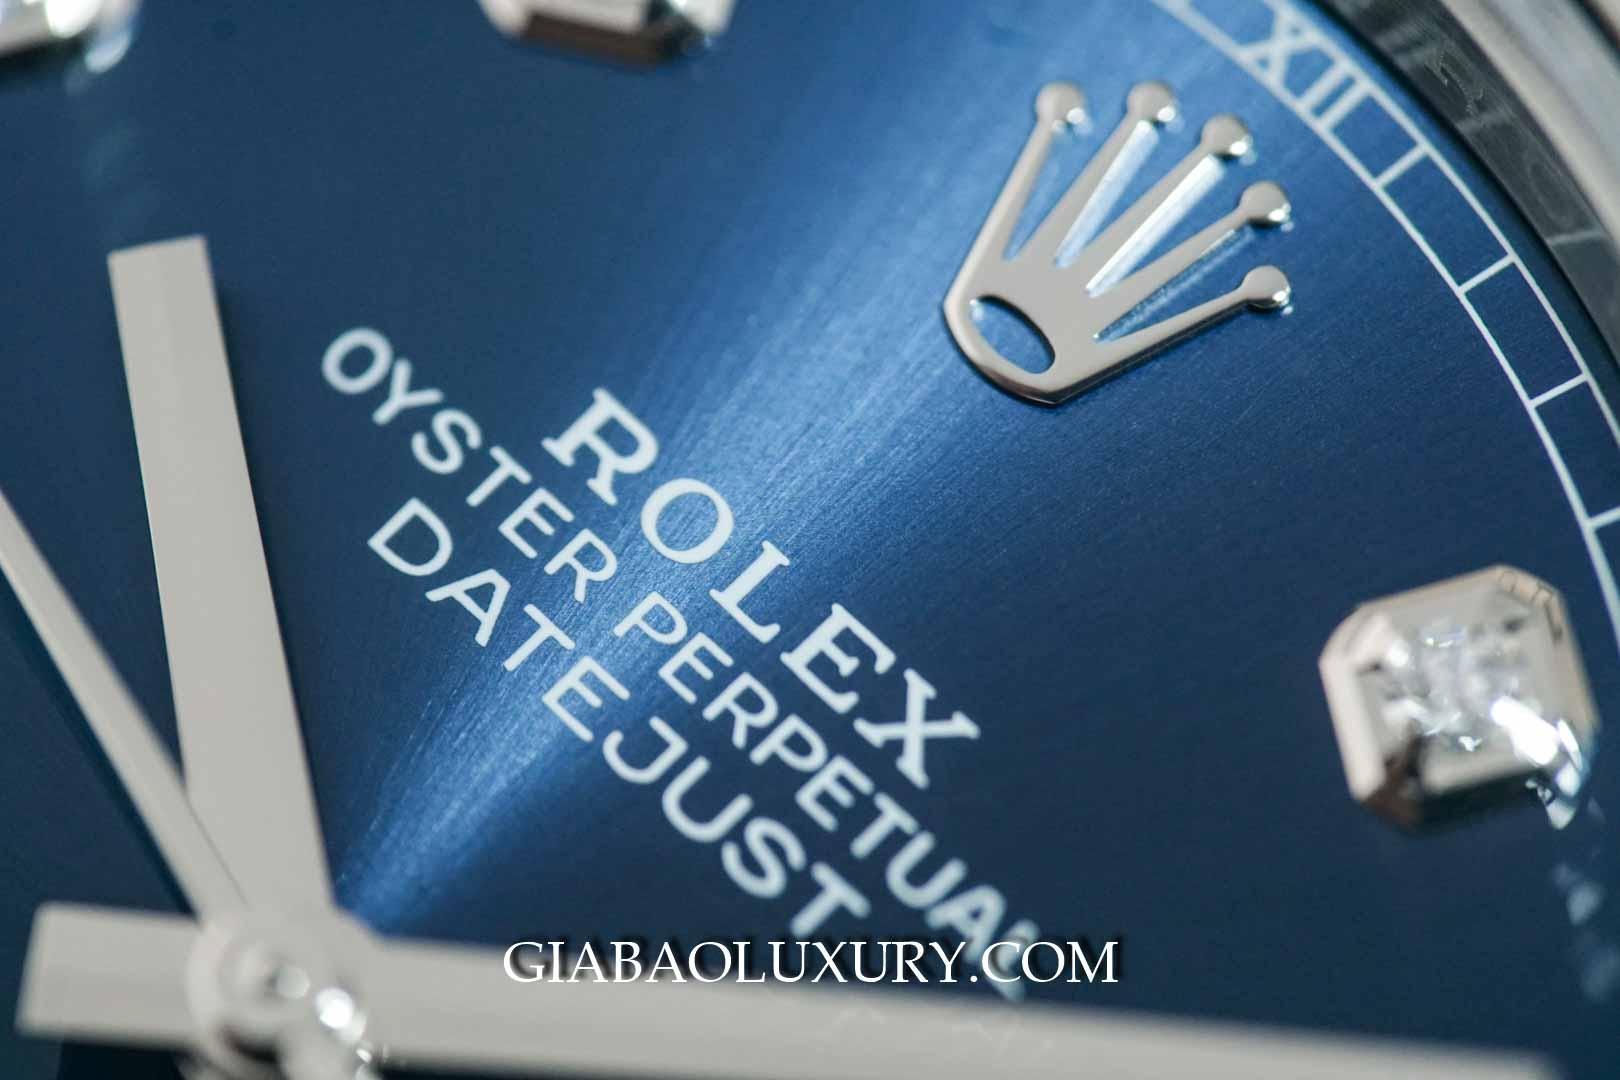 Đồng Hồ Rolex Datejust 41mm 126334 Mặt Xanh